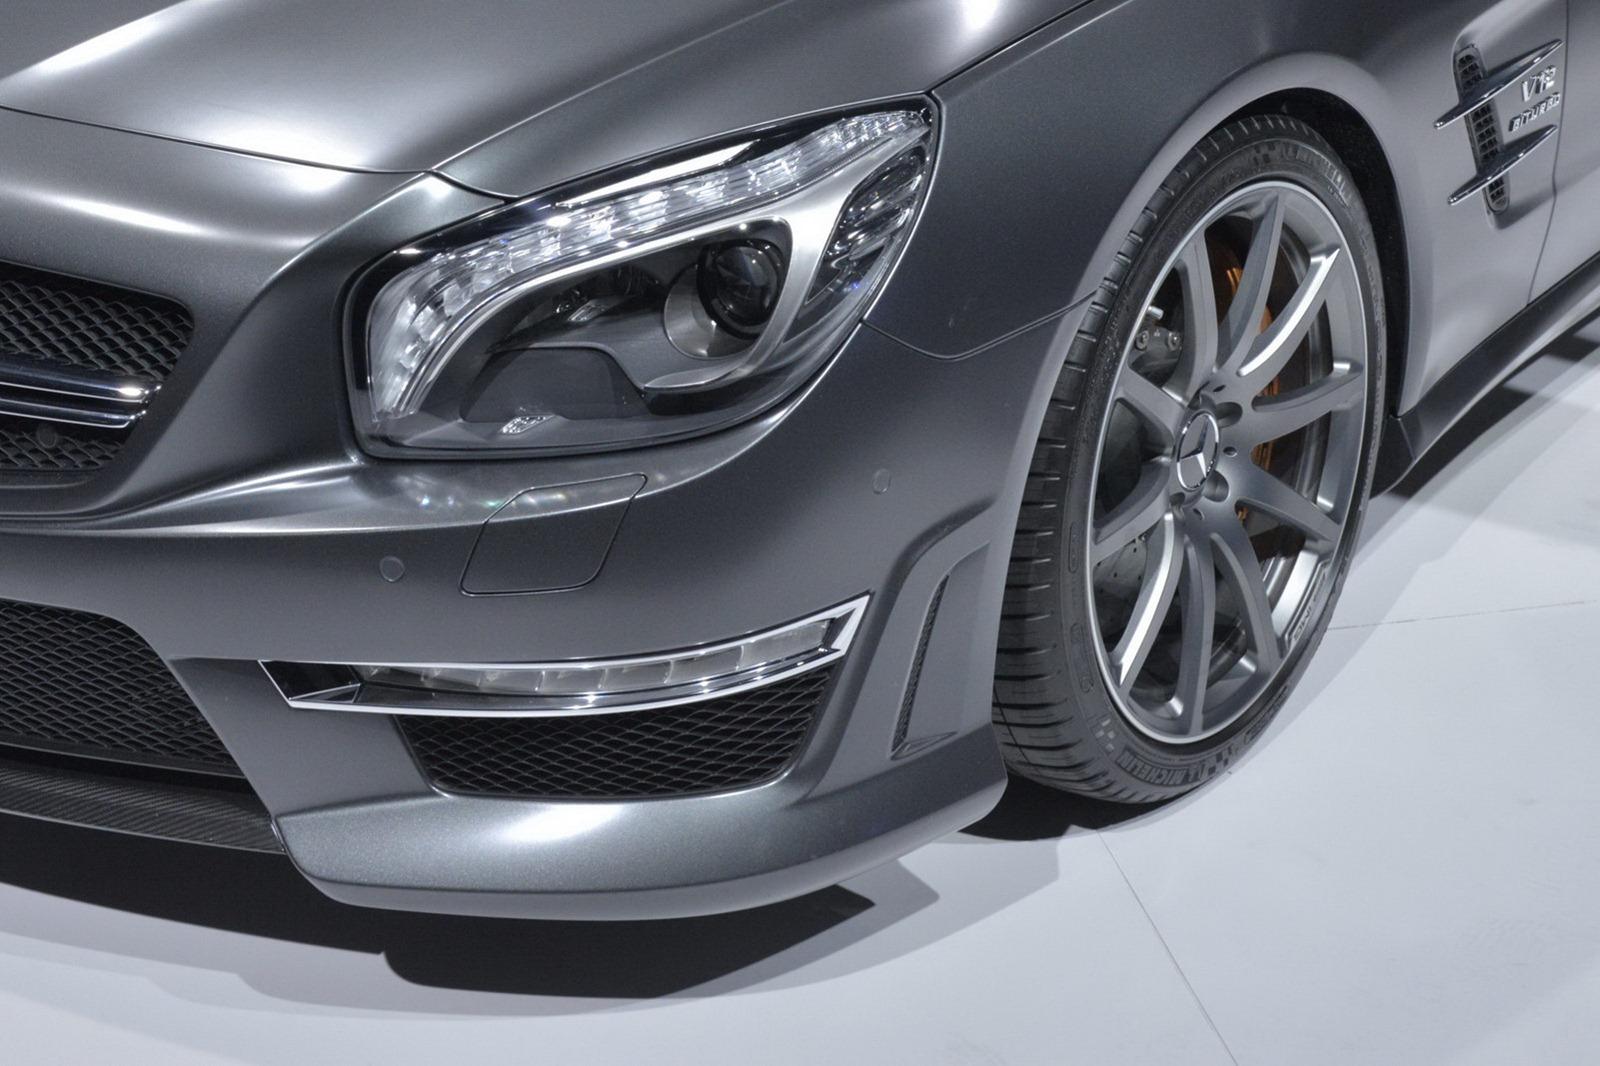 http://lh6.ggpht.com/-0y6iohcD2NU/T4BcSbNMRnI/AAAAAAAHSqg/VGXX9mZGcI0/s1600/2013-Mercedes-SL-AMG-45th-5%25255B2%25255D.jpg